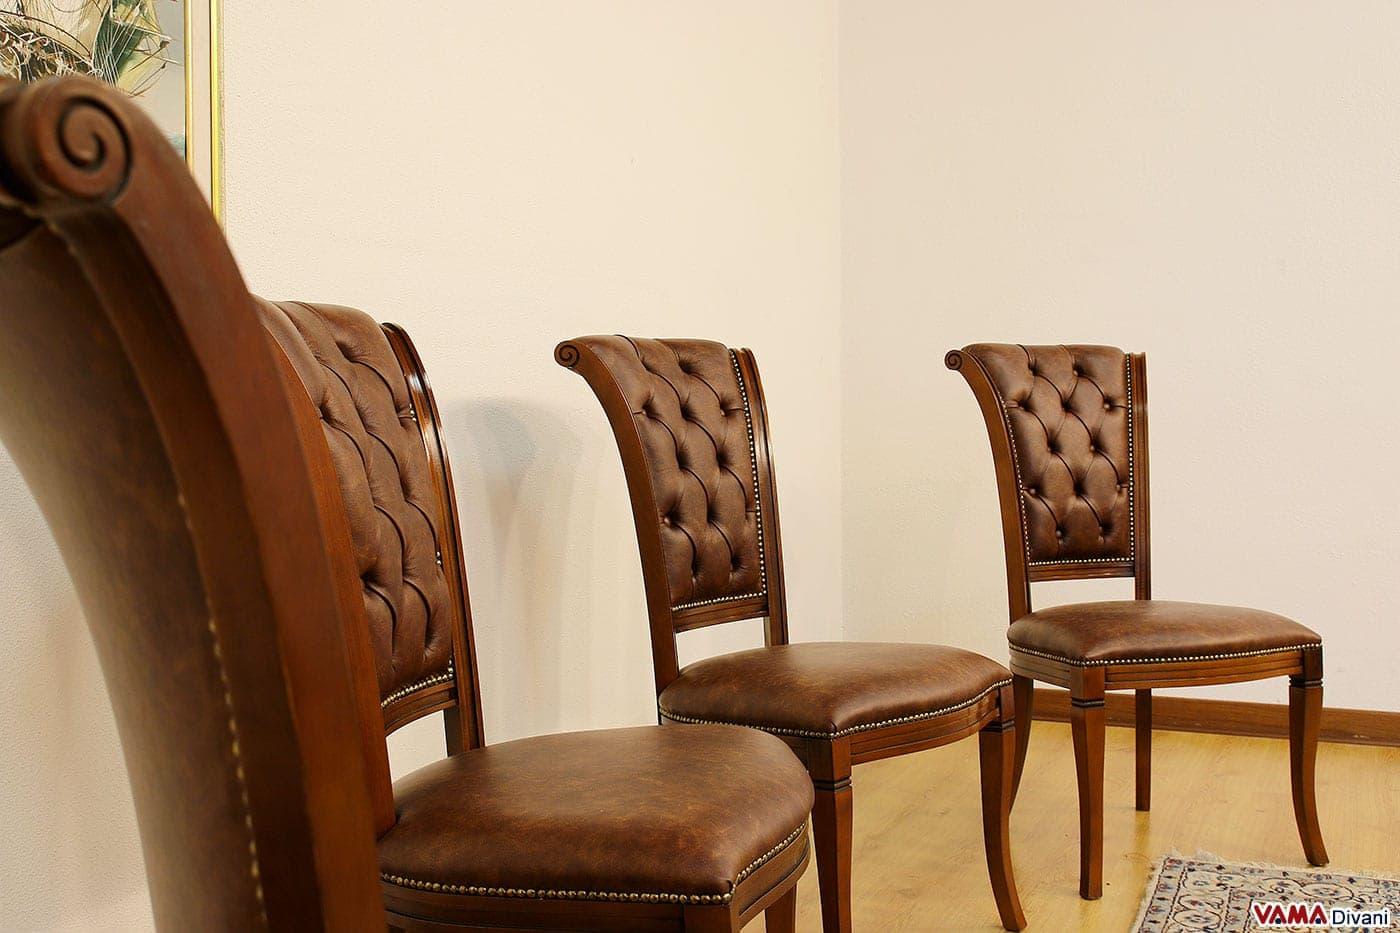 Sedie Classiche Imbottite Per Sala Da Pranzo.Imbottite Da Pranzo Per Sala Sedie Classiche I76vygmyfb